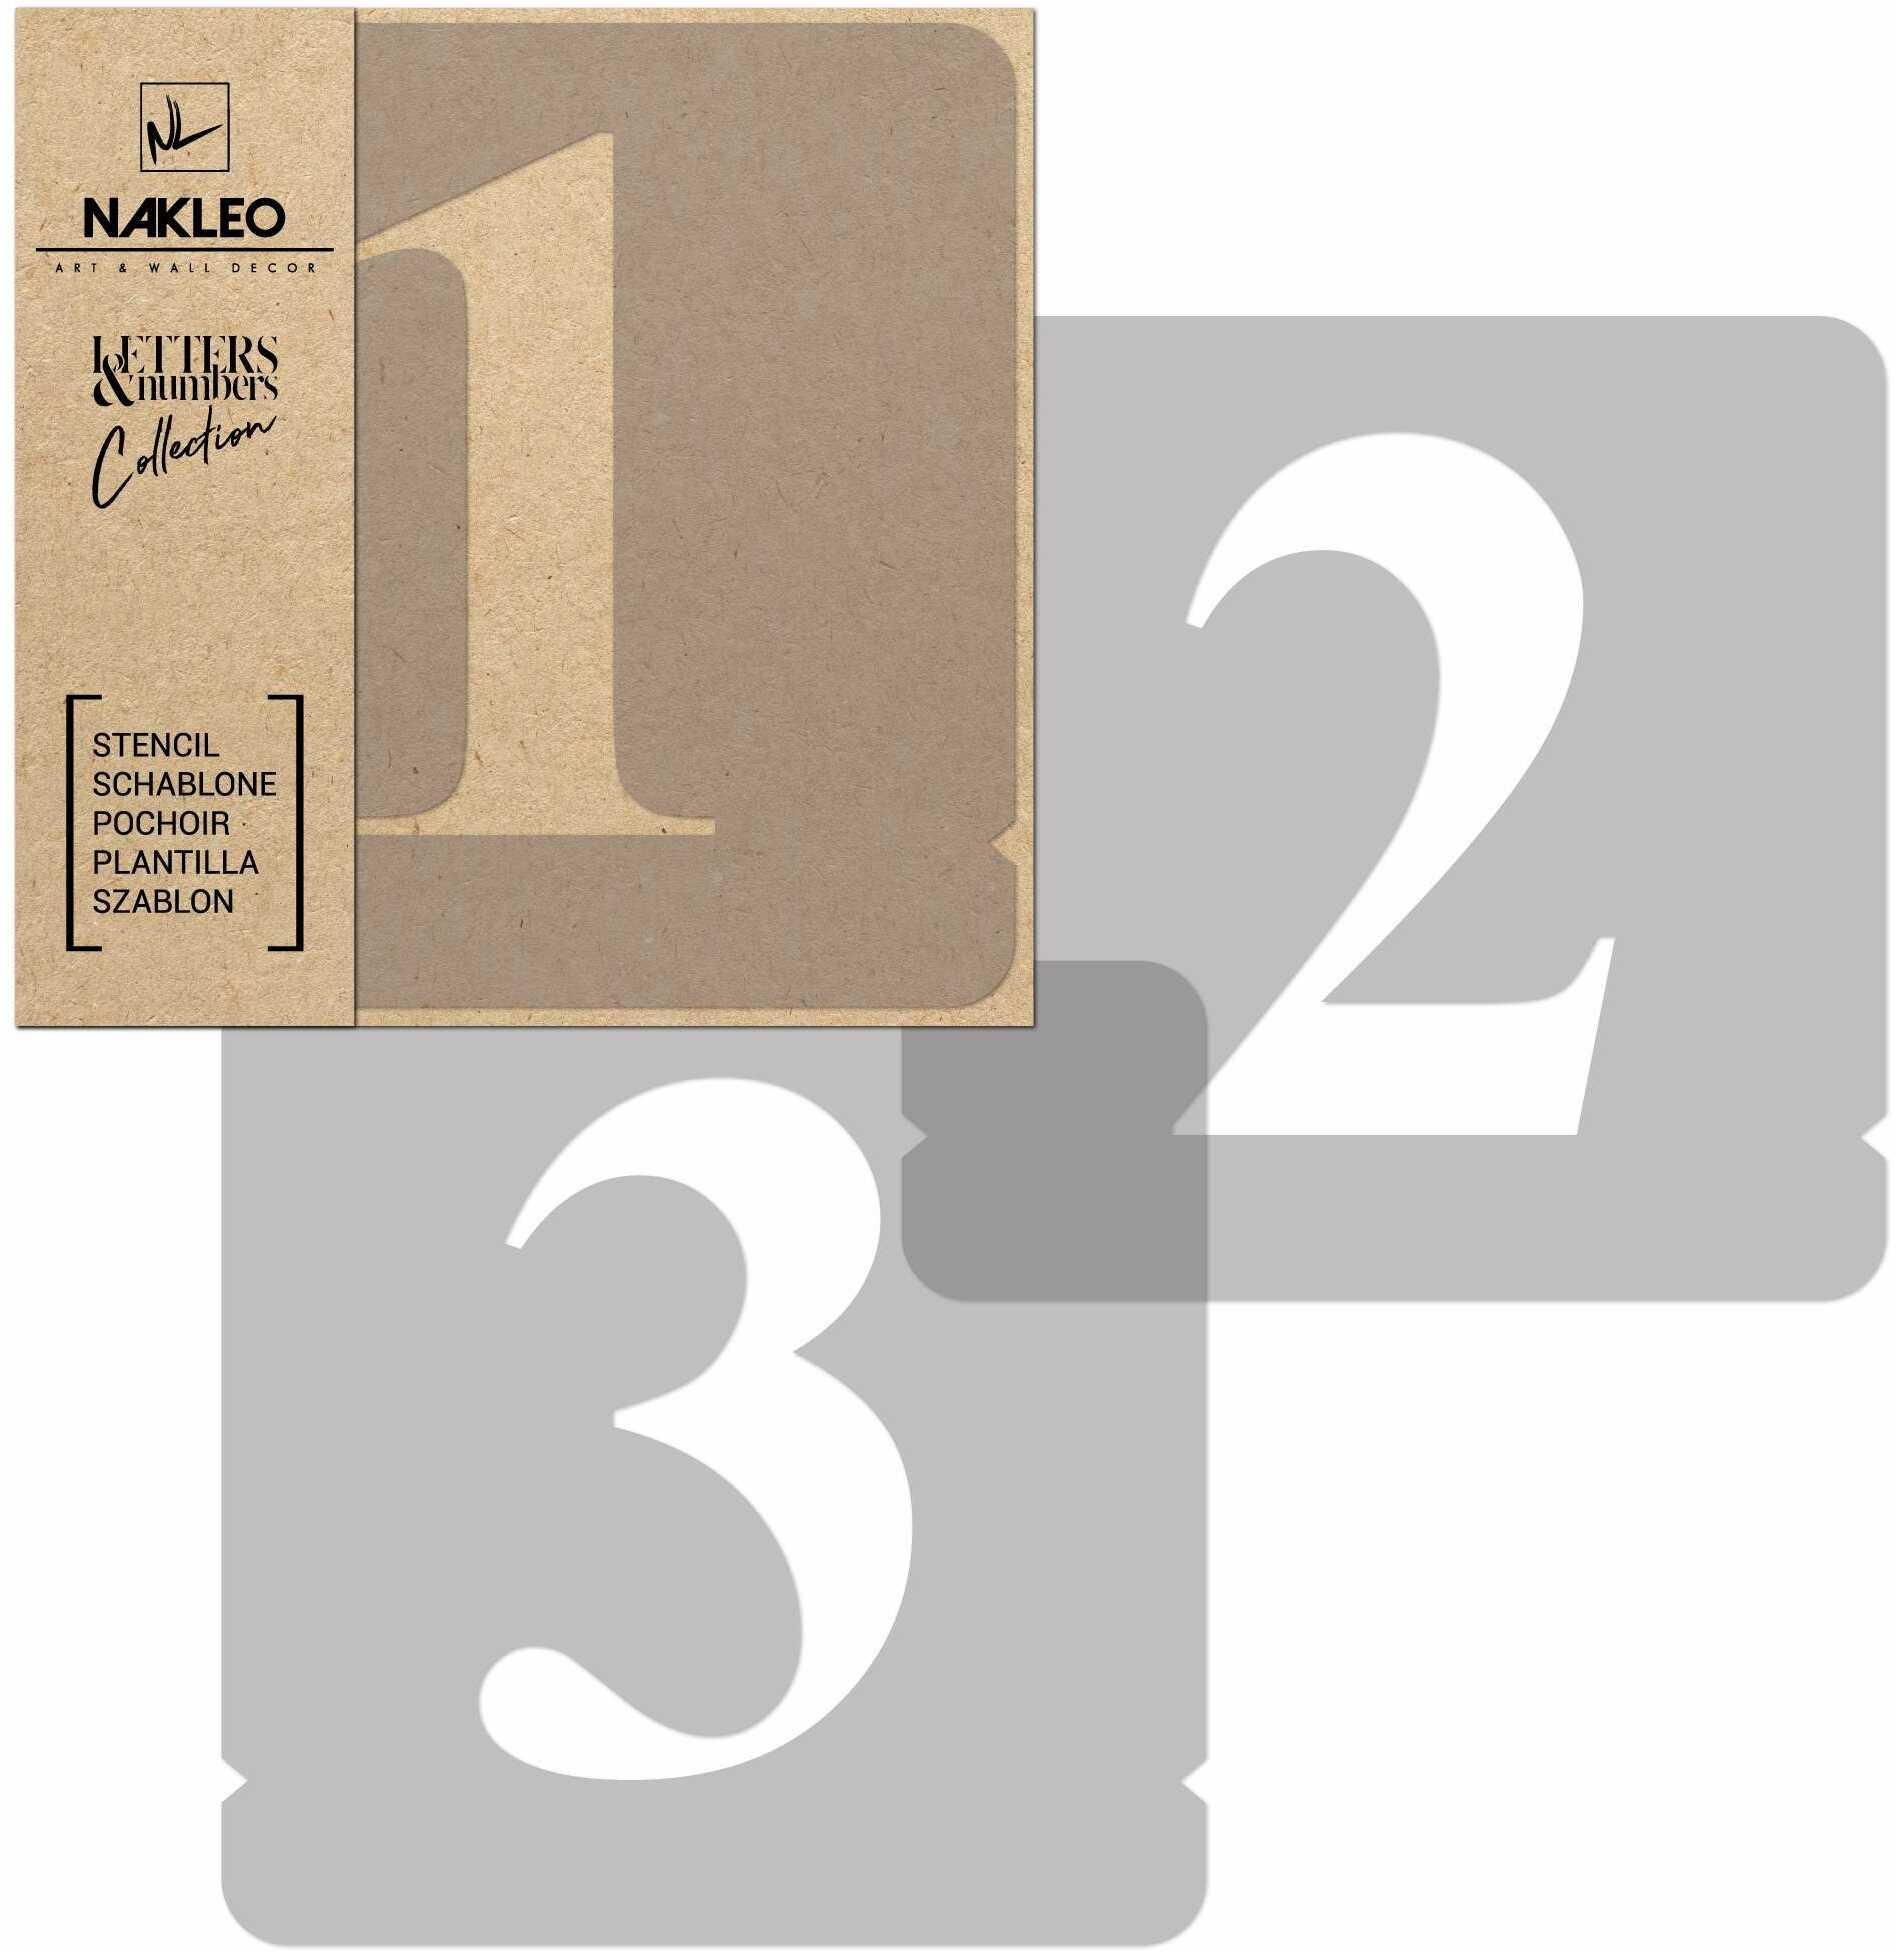 szablon malarski wielokrotny // cyfry 140 mm // Times Roman Cyfry